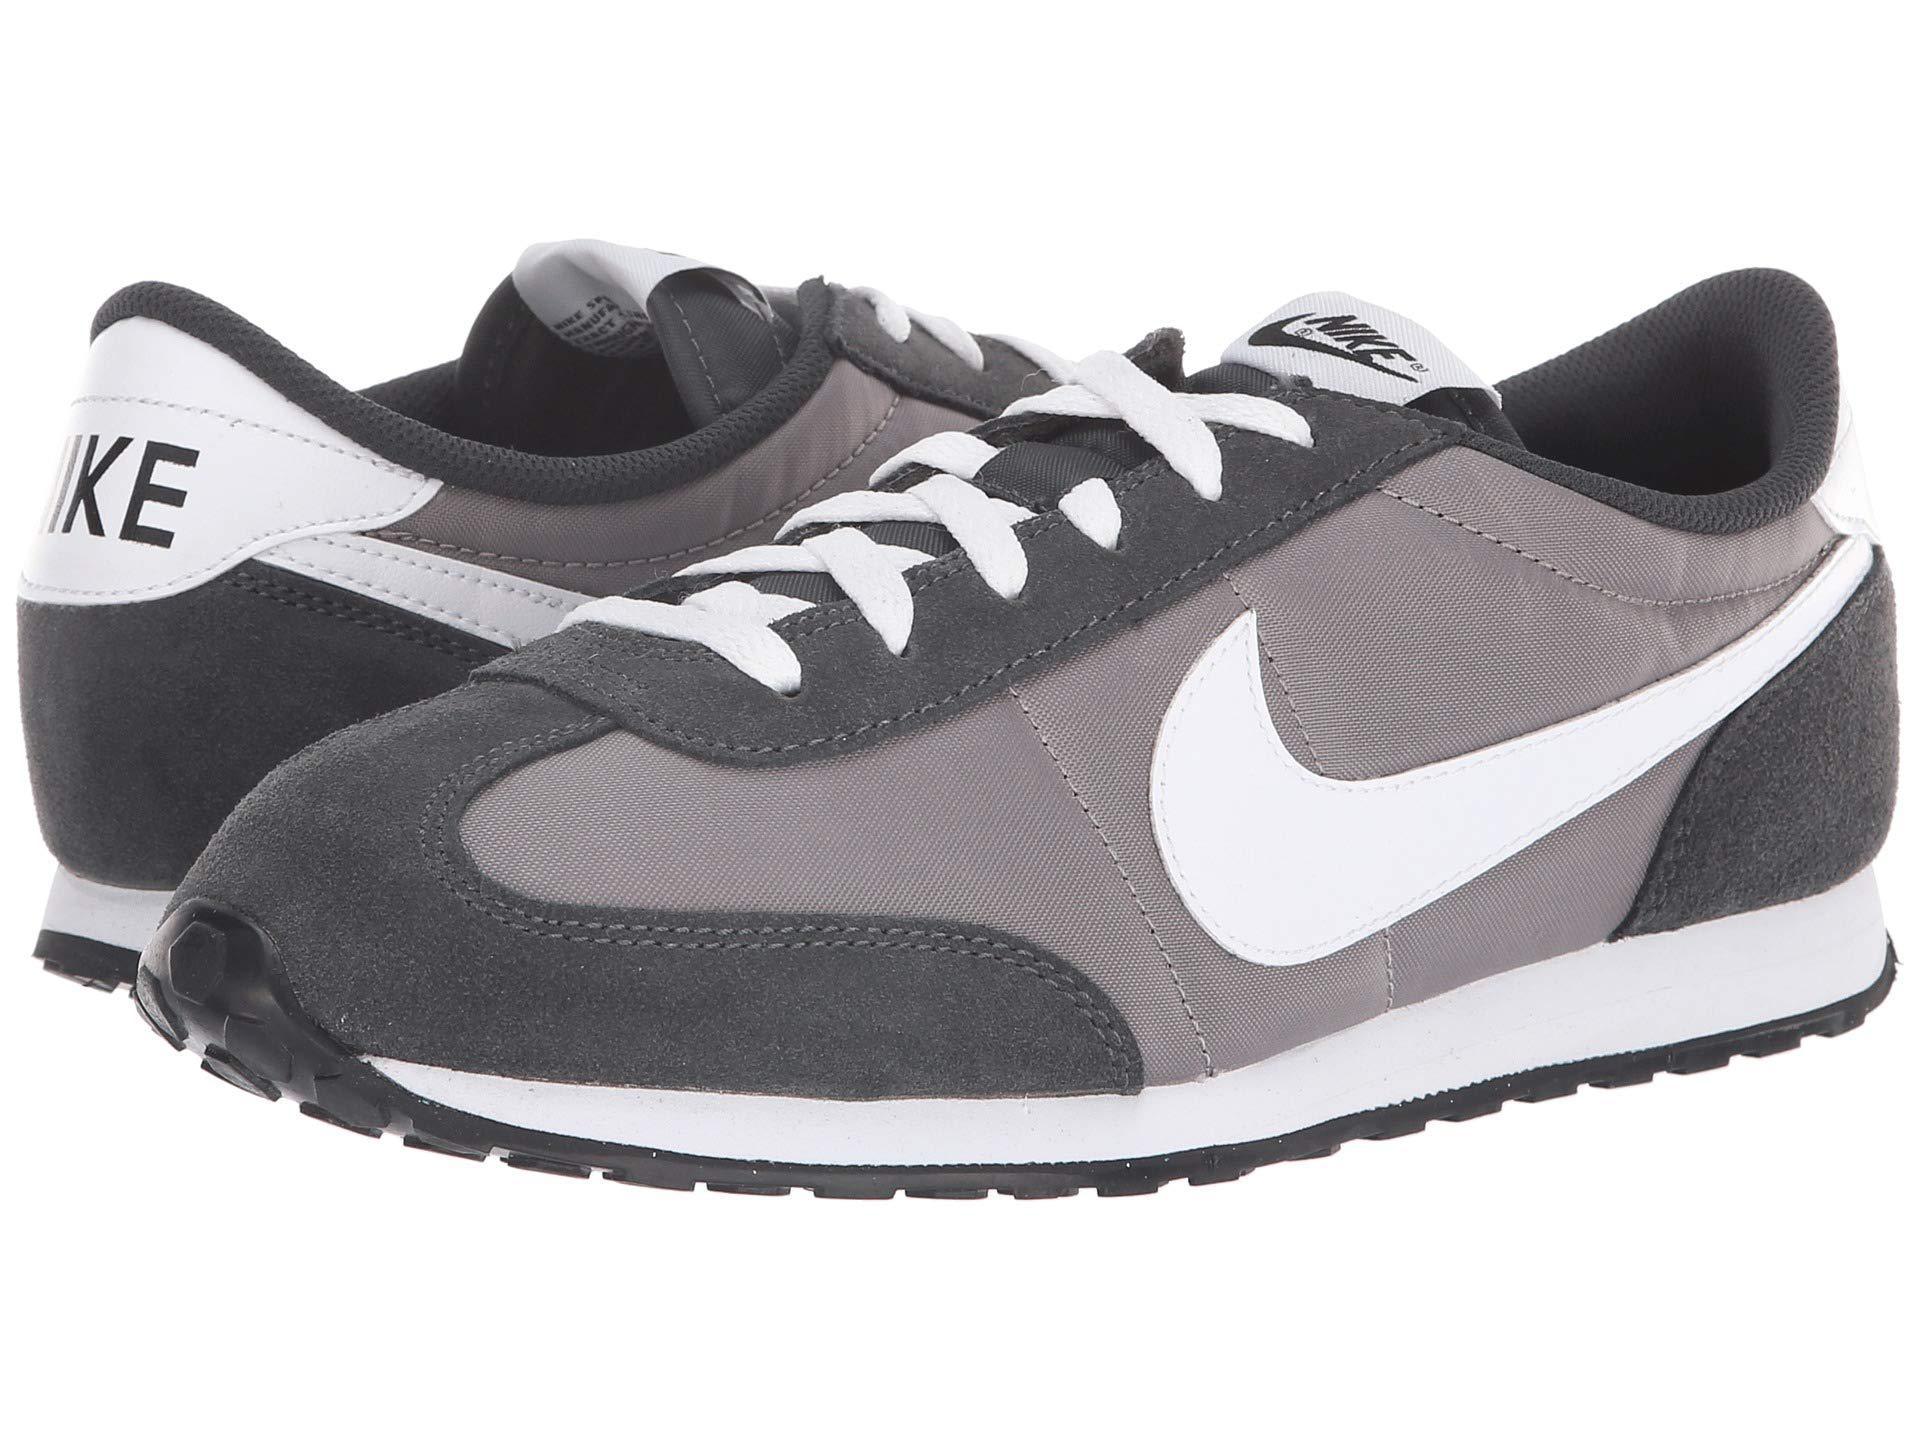 c2b0665e6efff Lyst - Nike Mach Runner (sport Grey white anthracite black) Men s ...